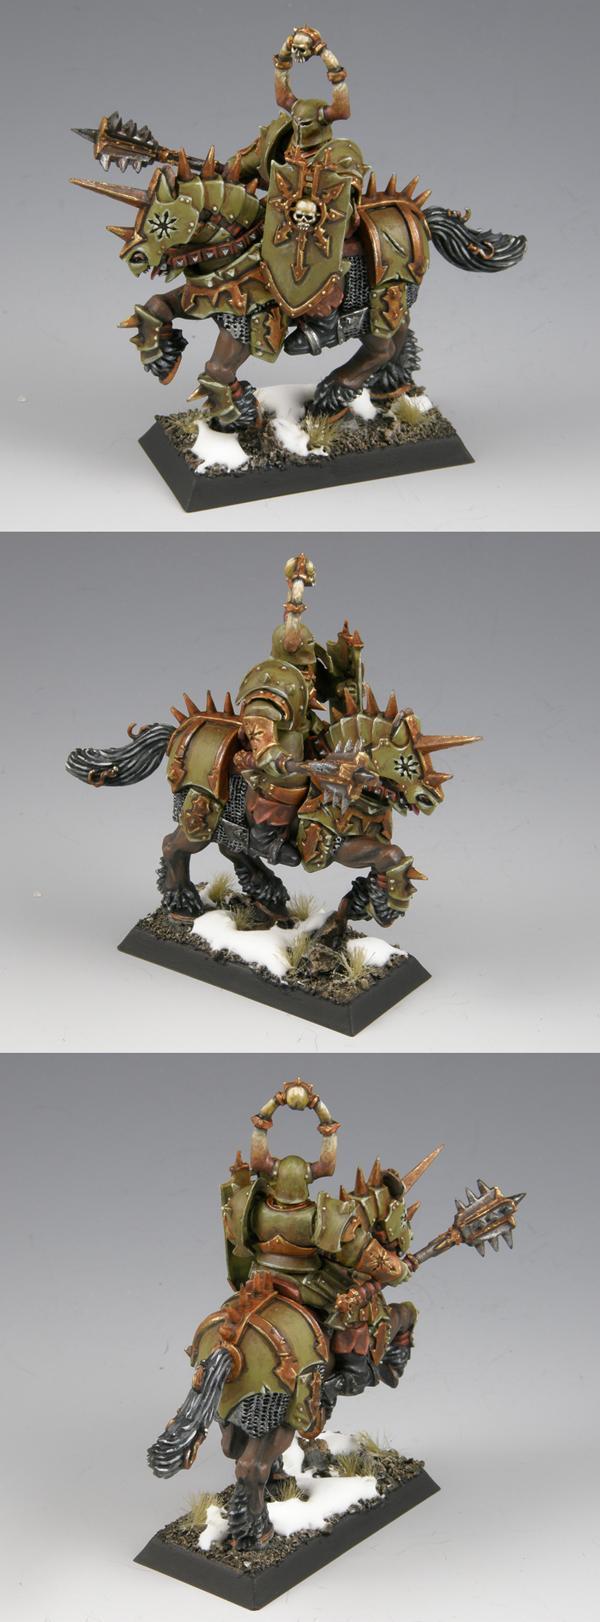 Chaos Knight, Gemrich, Snow, Warhammer Fantasy